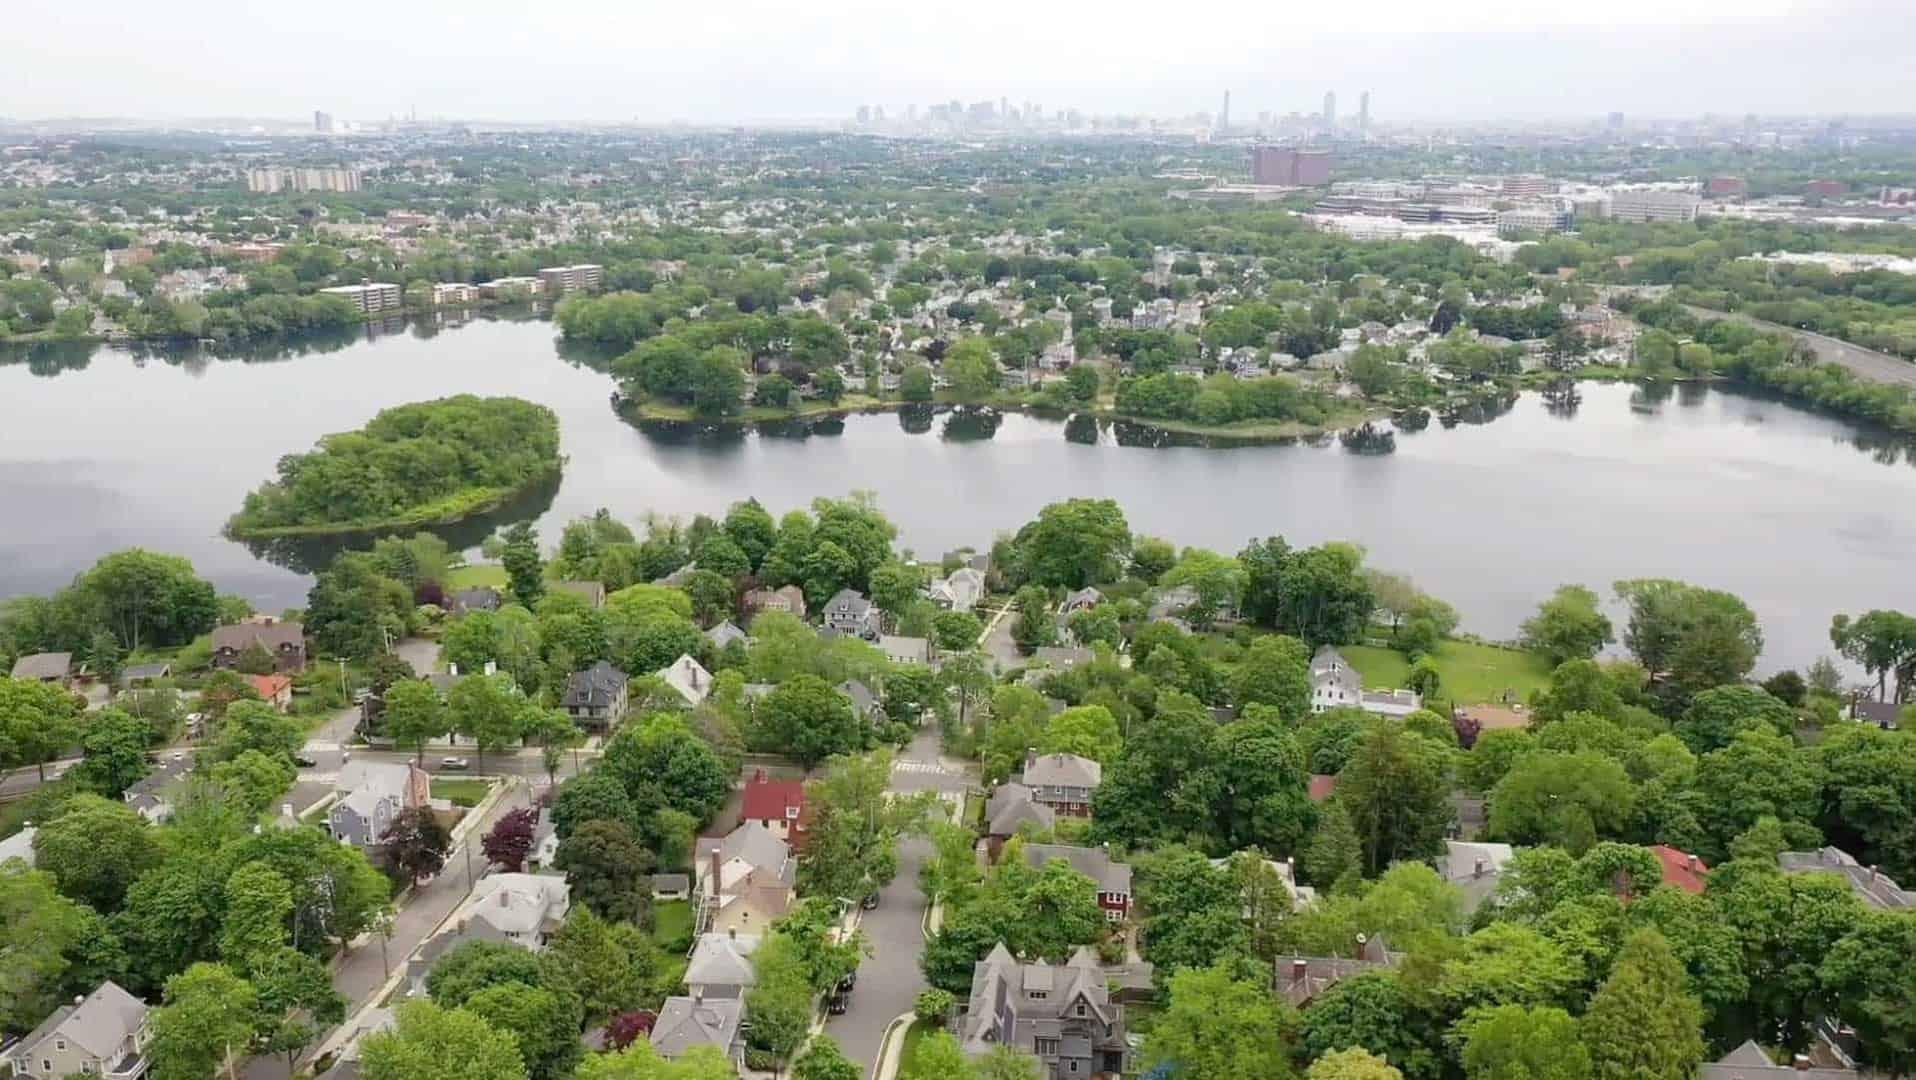 residential lake area